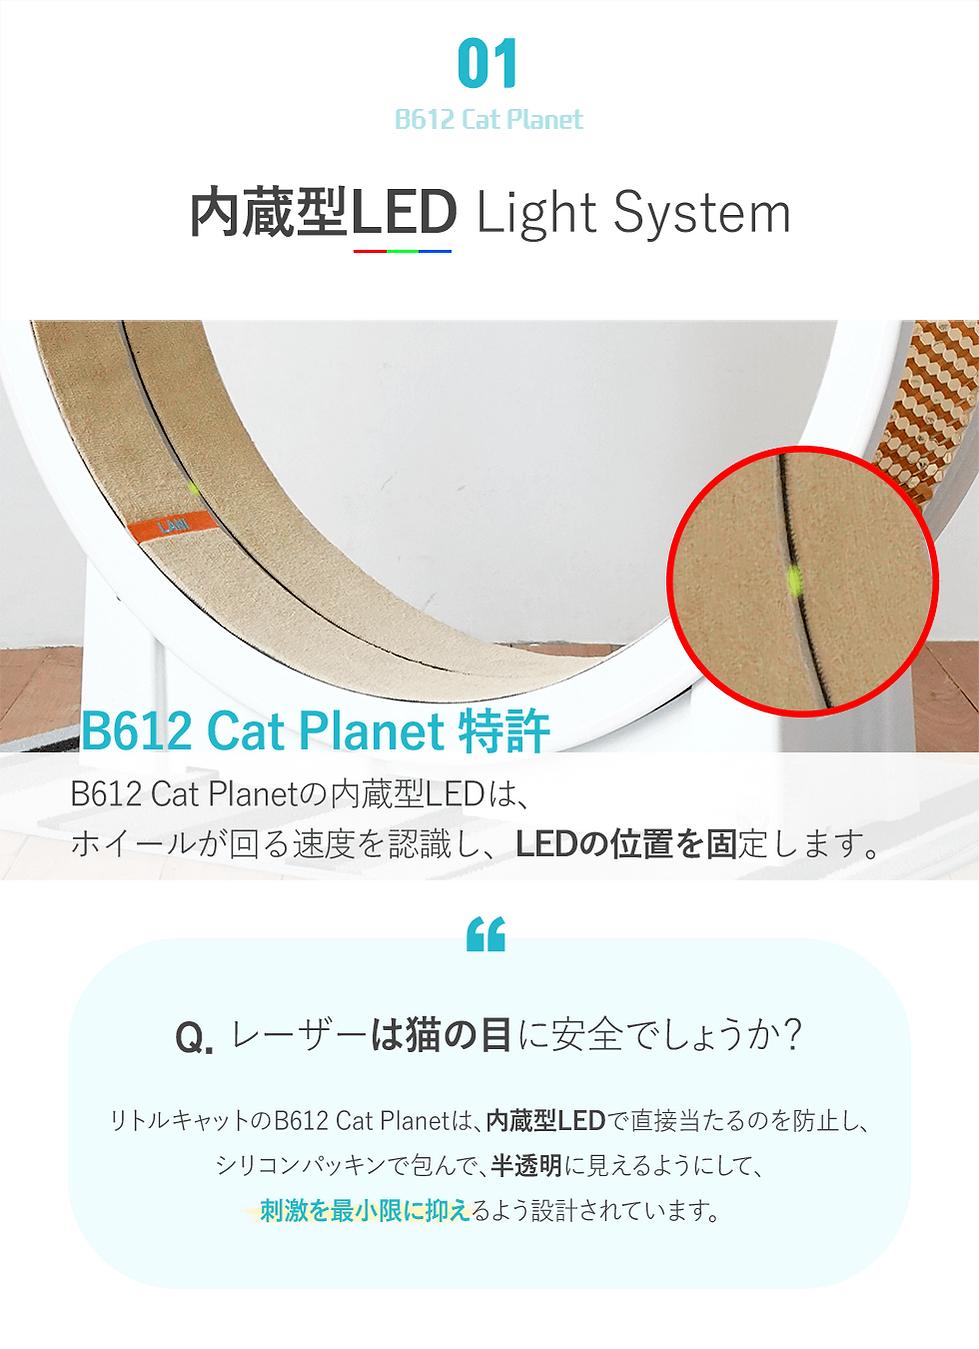 japan_detail_04_01.png